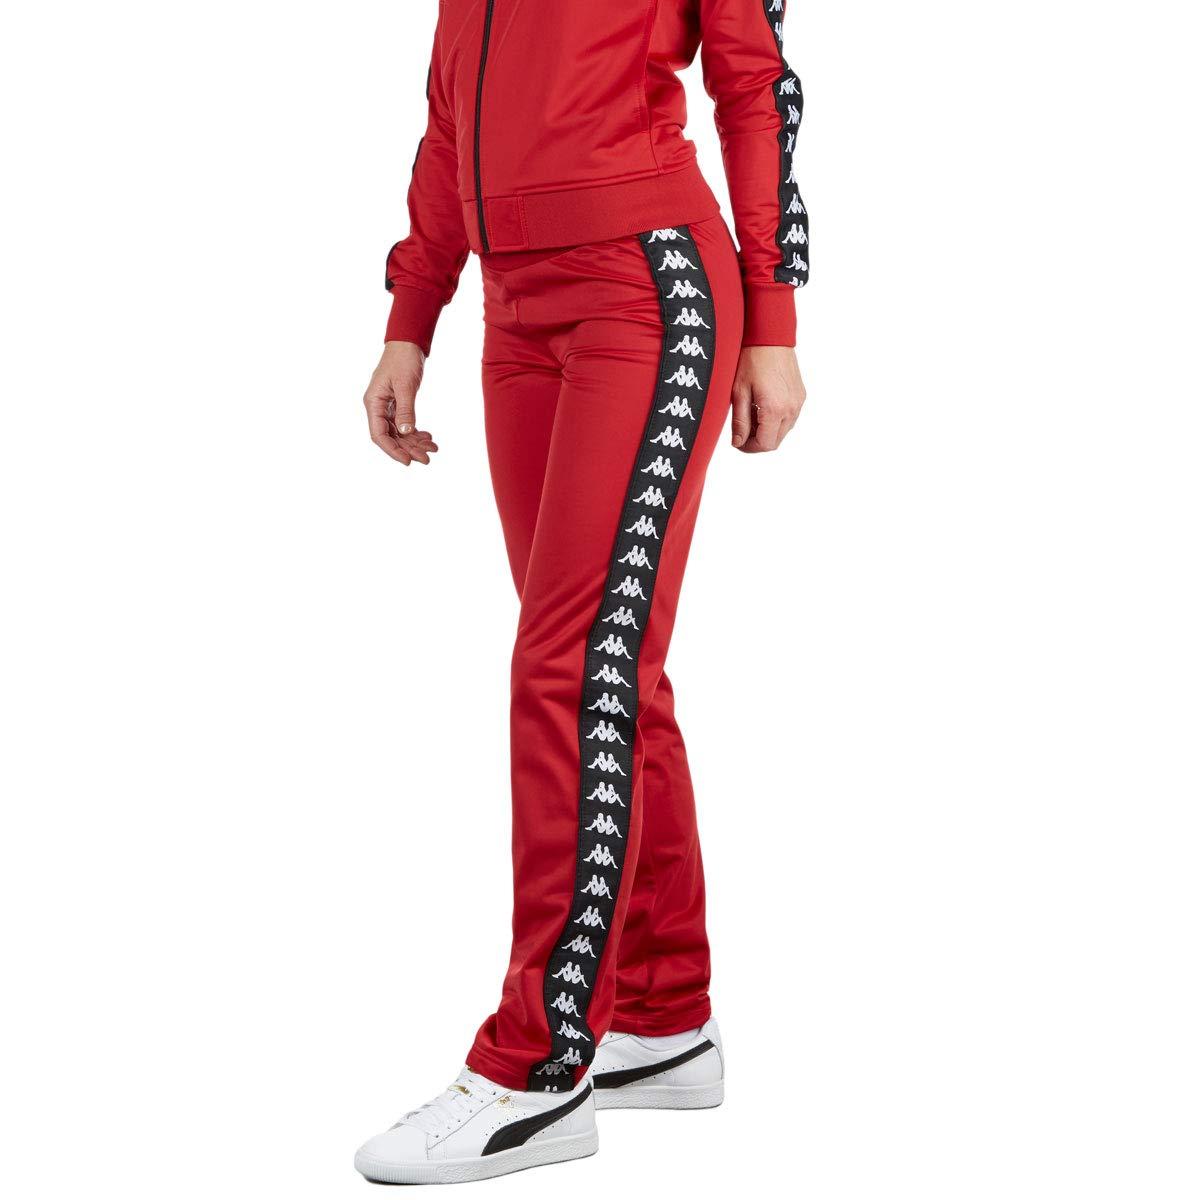 1bb9f758eb Kappa Womens 222 Banda Wastoria Pants - Dark Red/Black - LG at ...